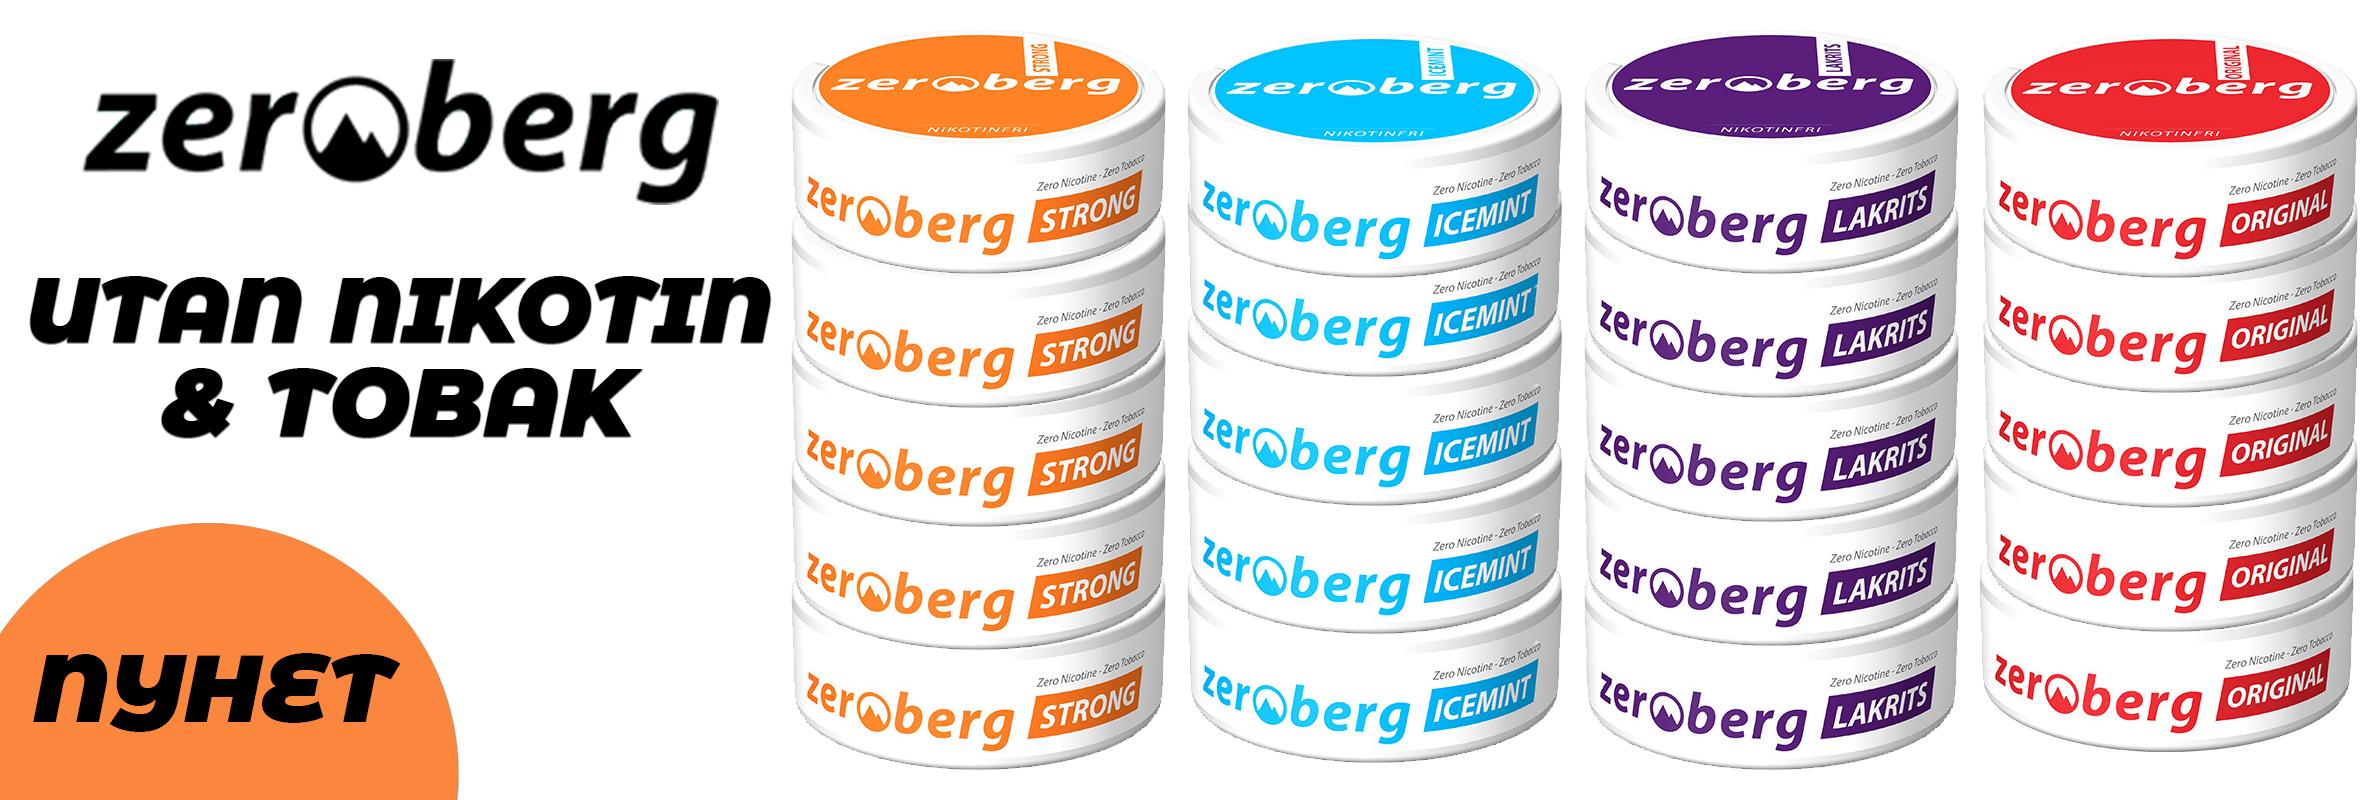 zeroberg snus